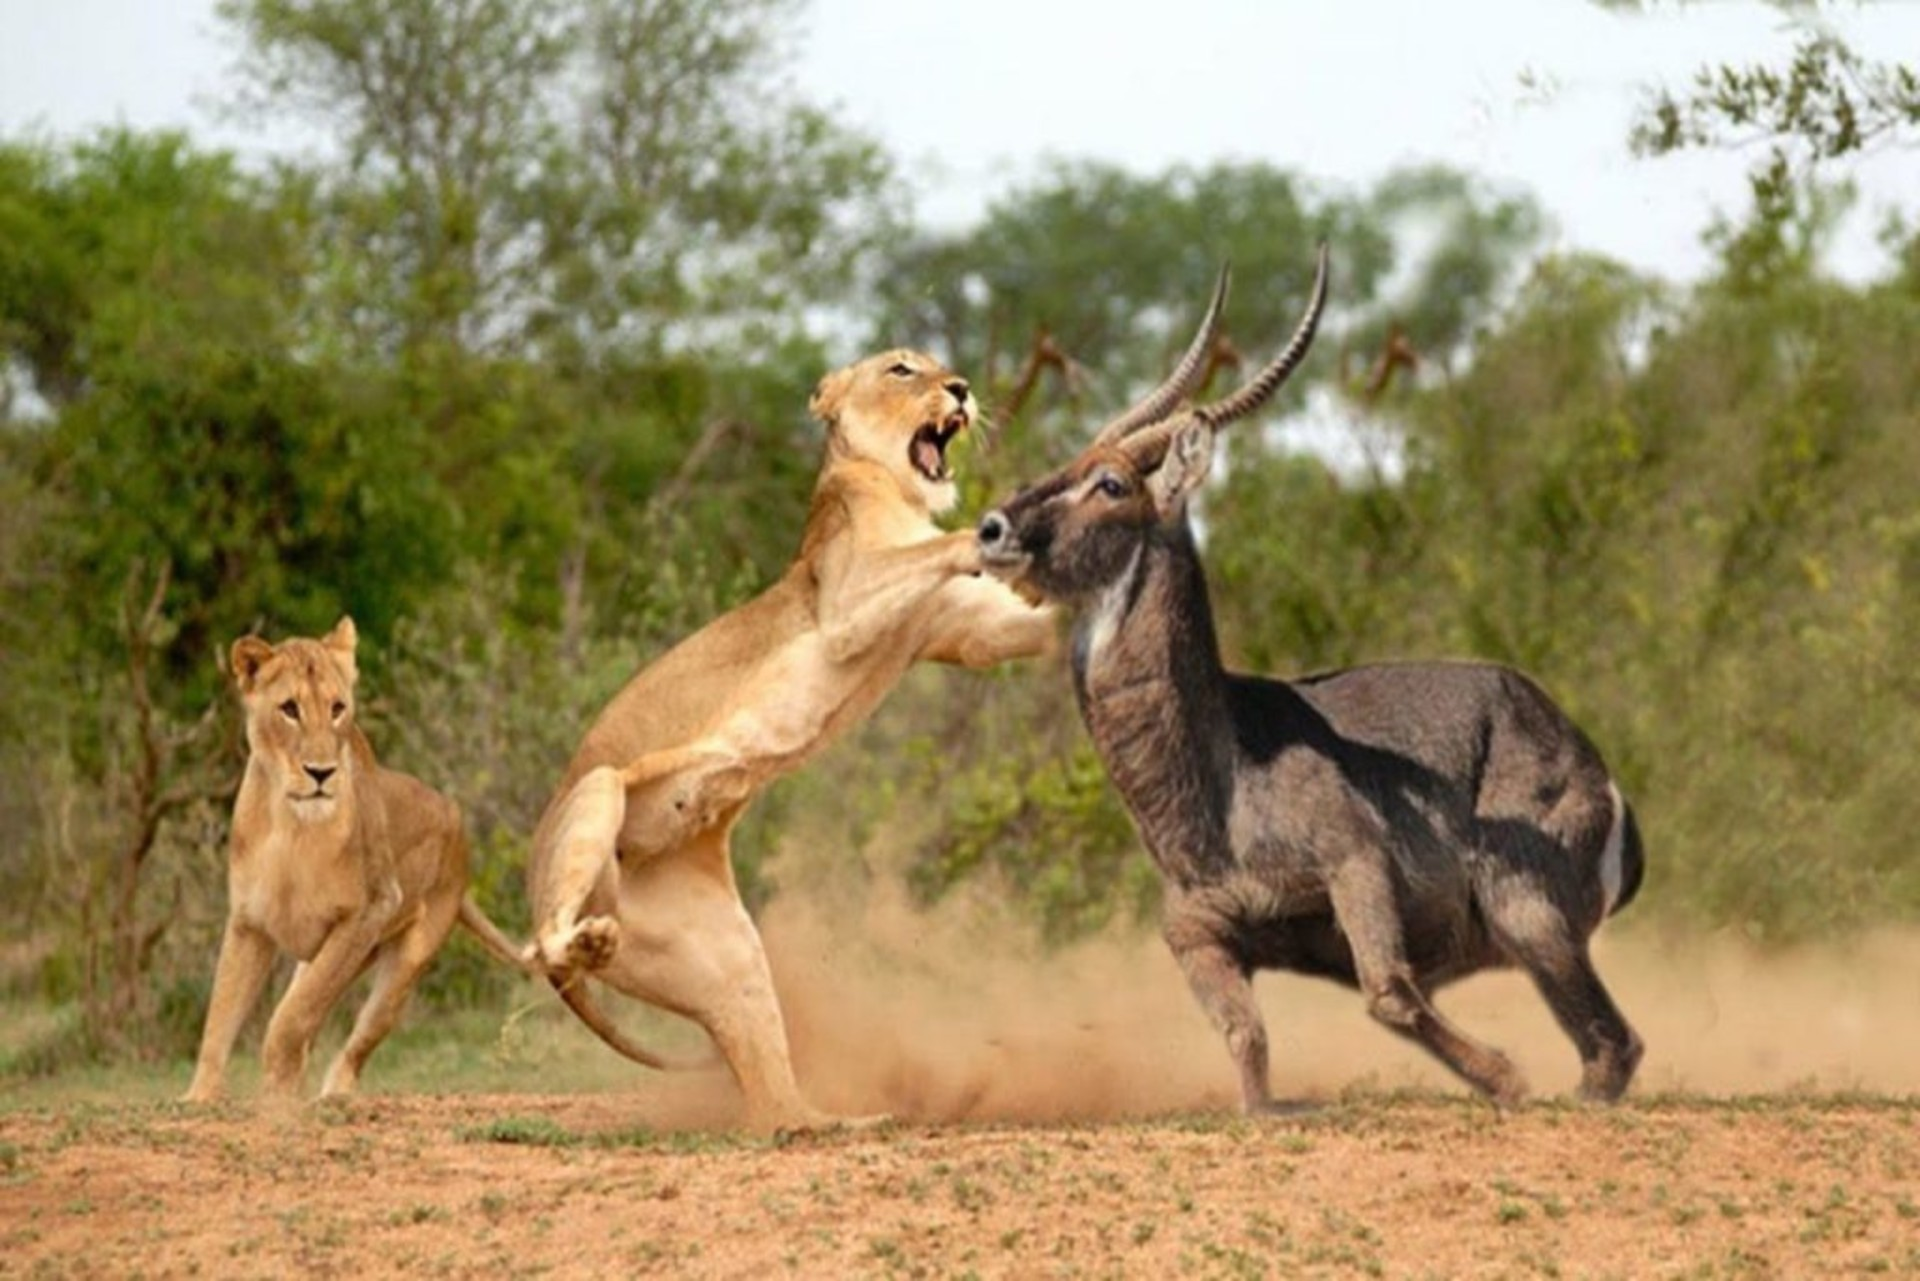 Masai-Mara-National-Park-lion.jpg